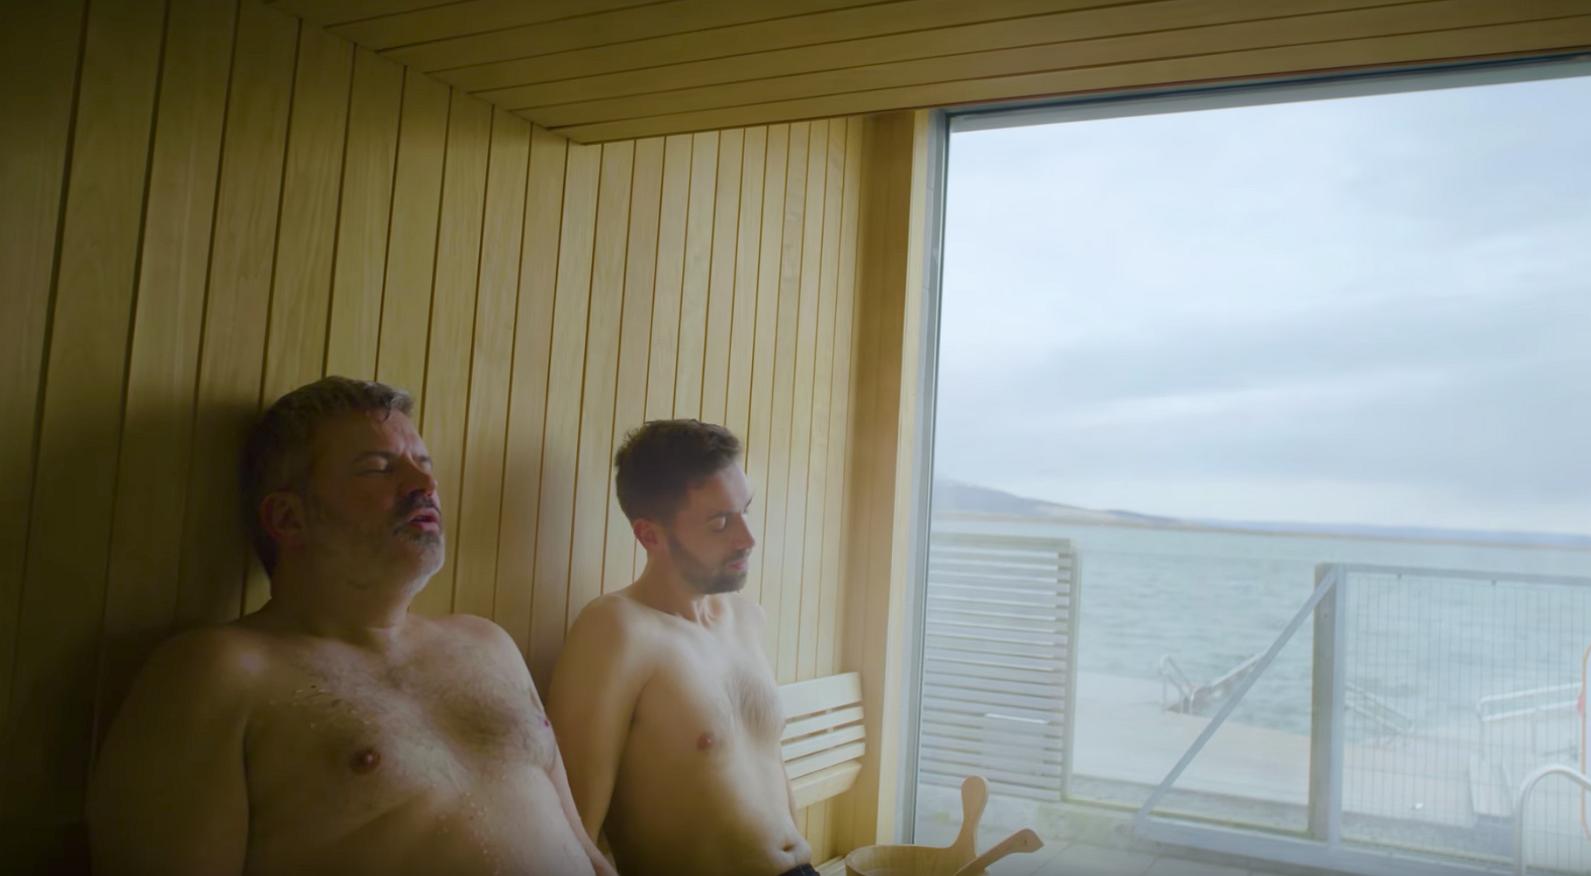 Videosnack | Homokoppel krijgt hoofdrol in Icelandair-reclame